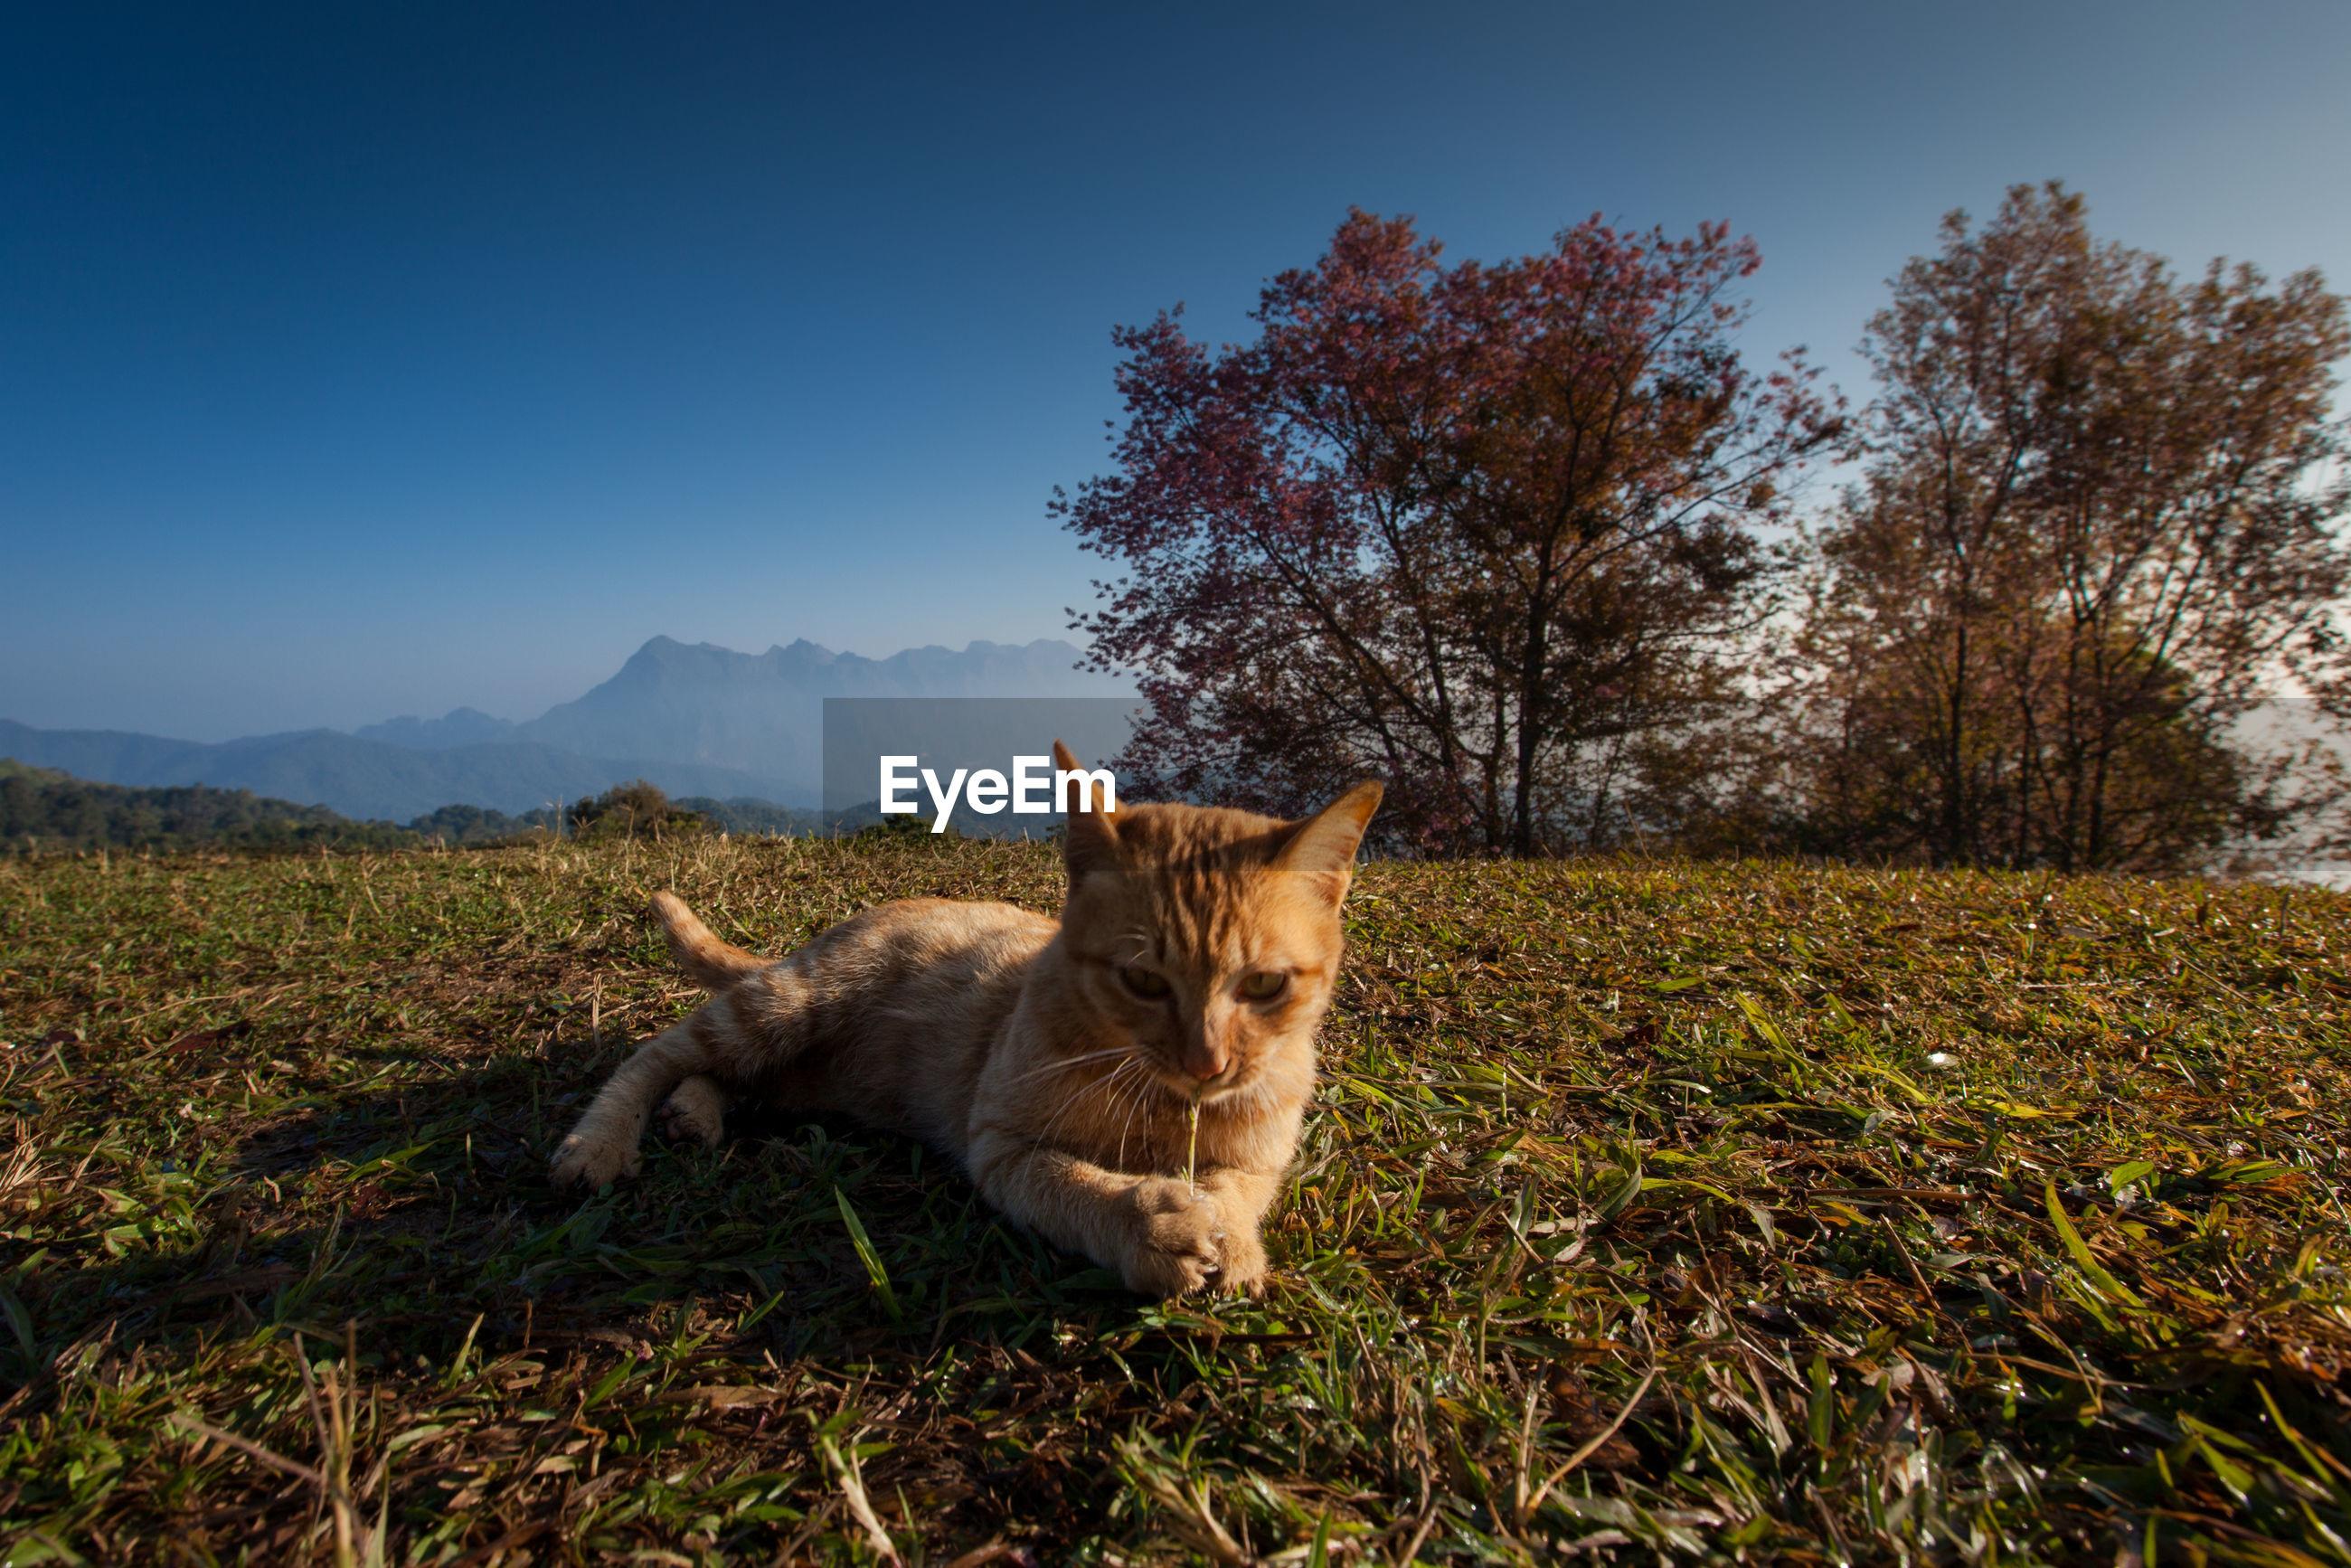 Portrait of ginger cat sitting on grass